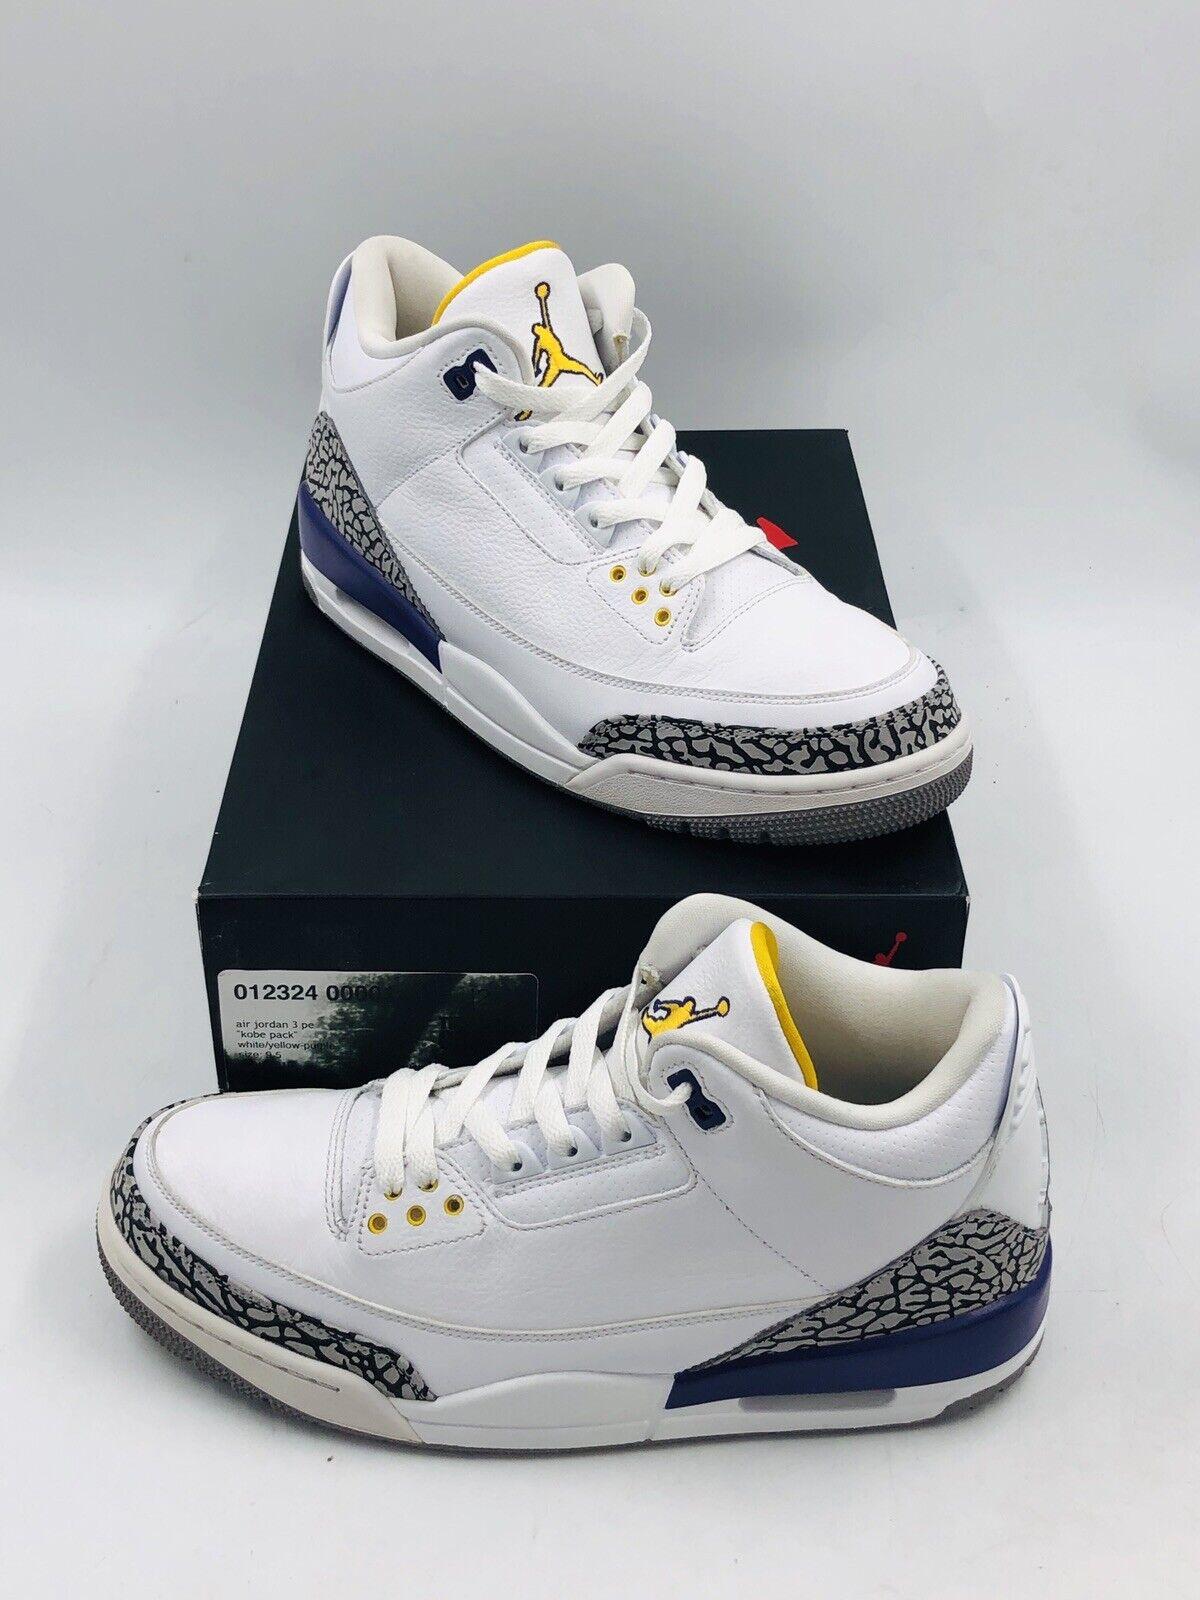 Air Jordan Retro 3 'Kobe Bryant' PE Very Rare Size 9.5 (136064-107) W  Box